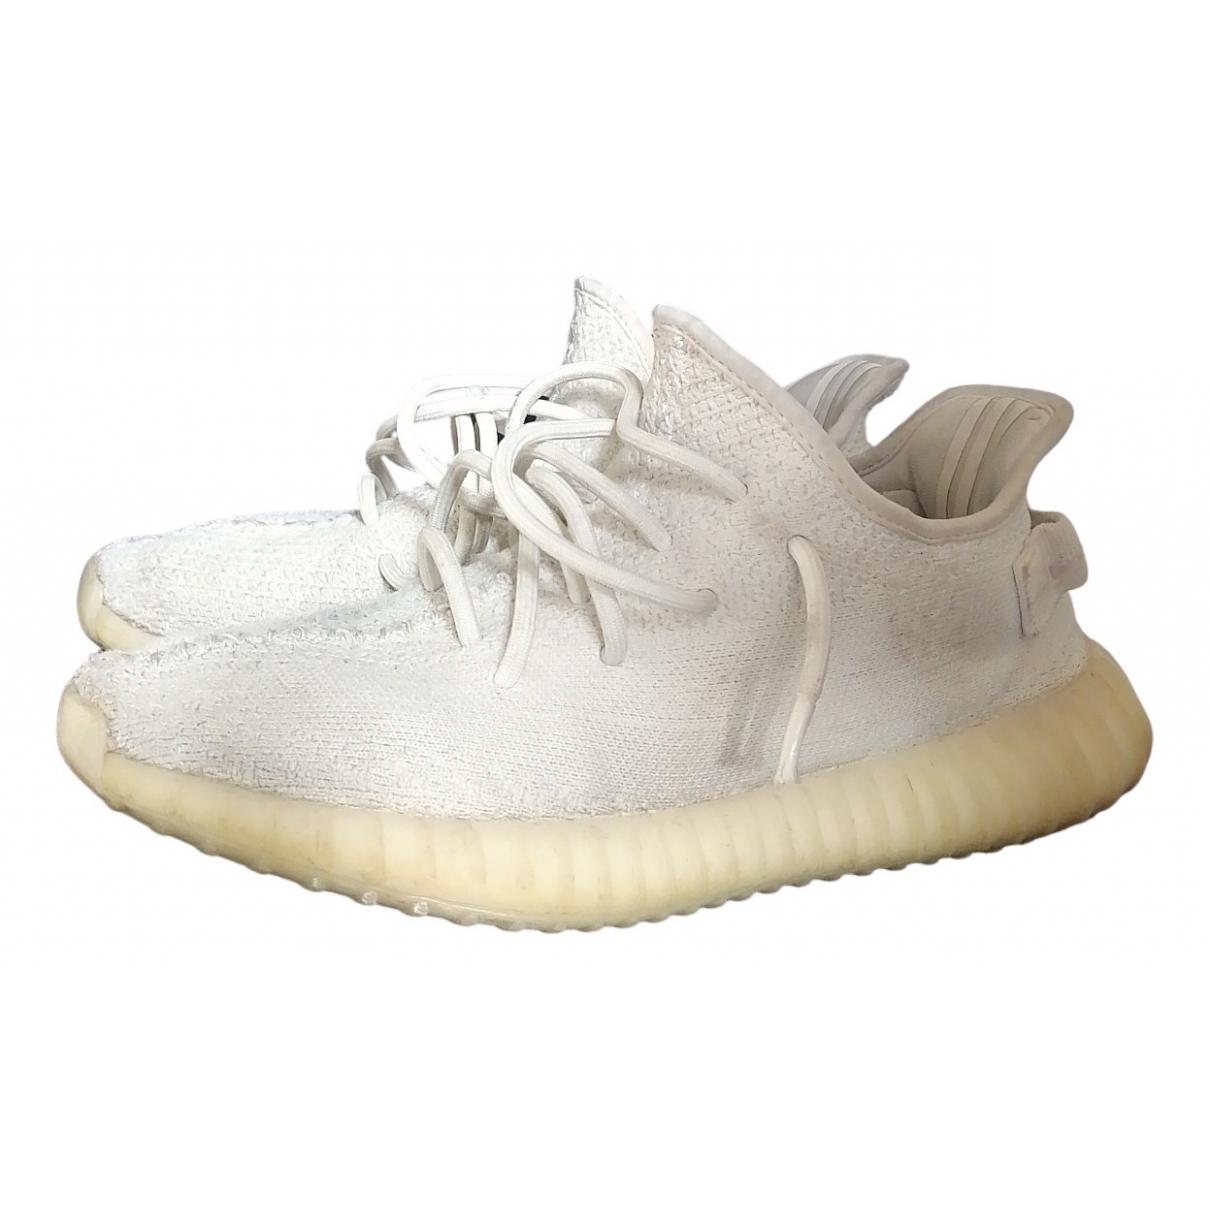 Yeezy X Adidas - Baskets Boost 350 V2 pour homme en toile - blanc